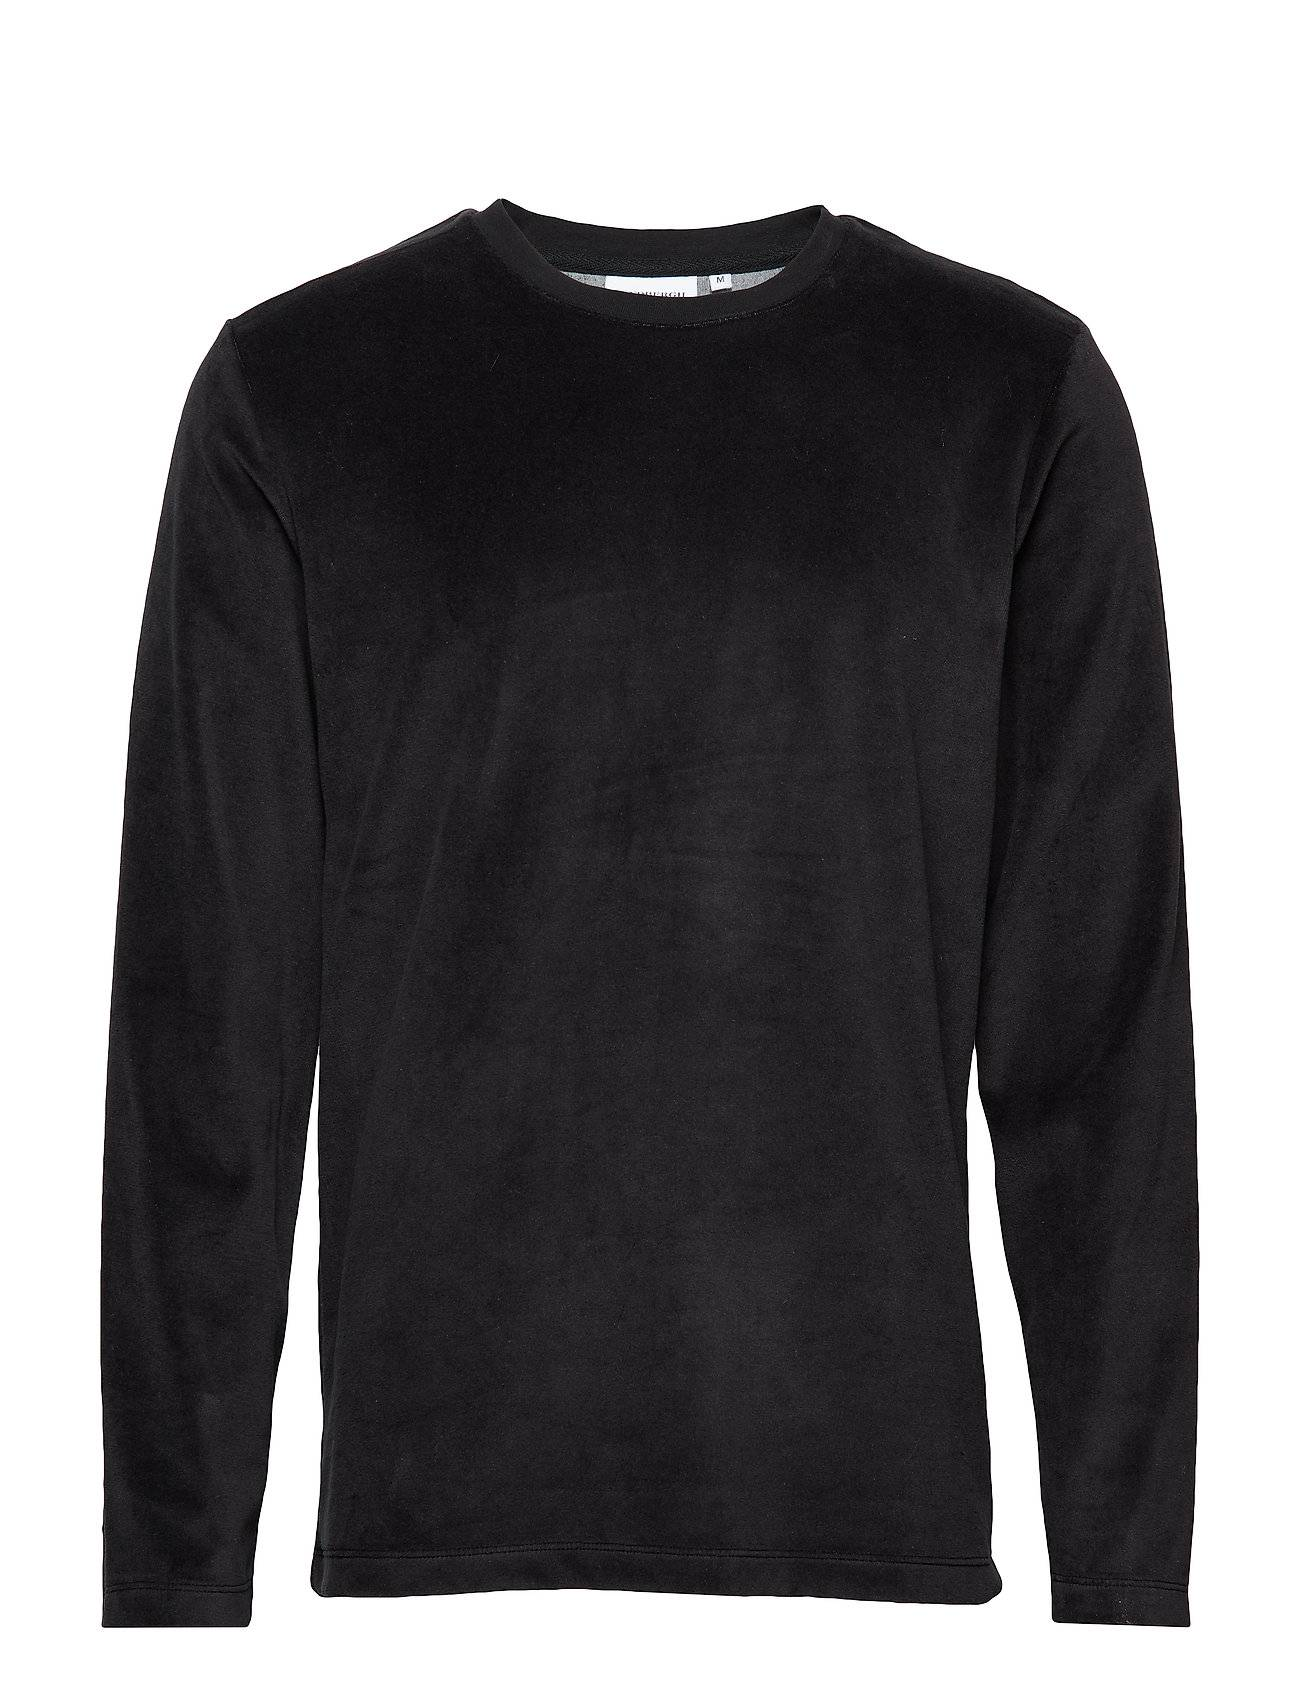 Lindbergh Velvet Sweatshirt